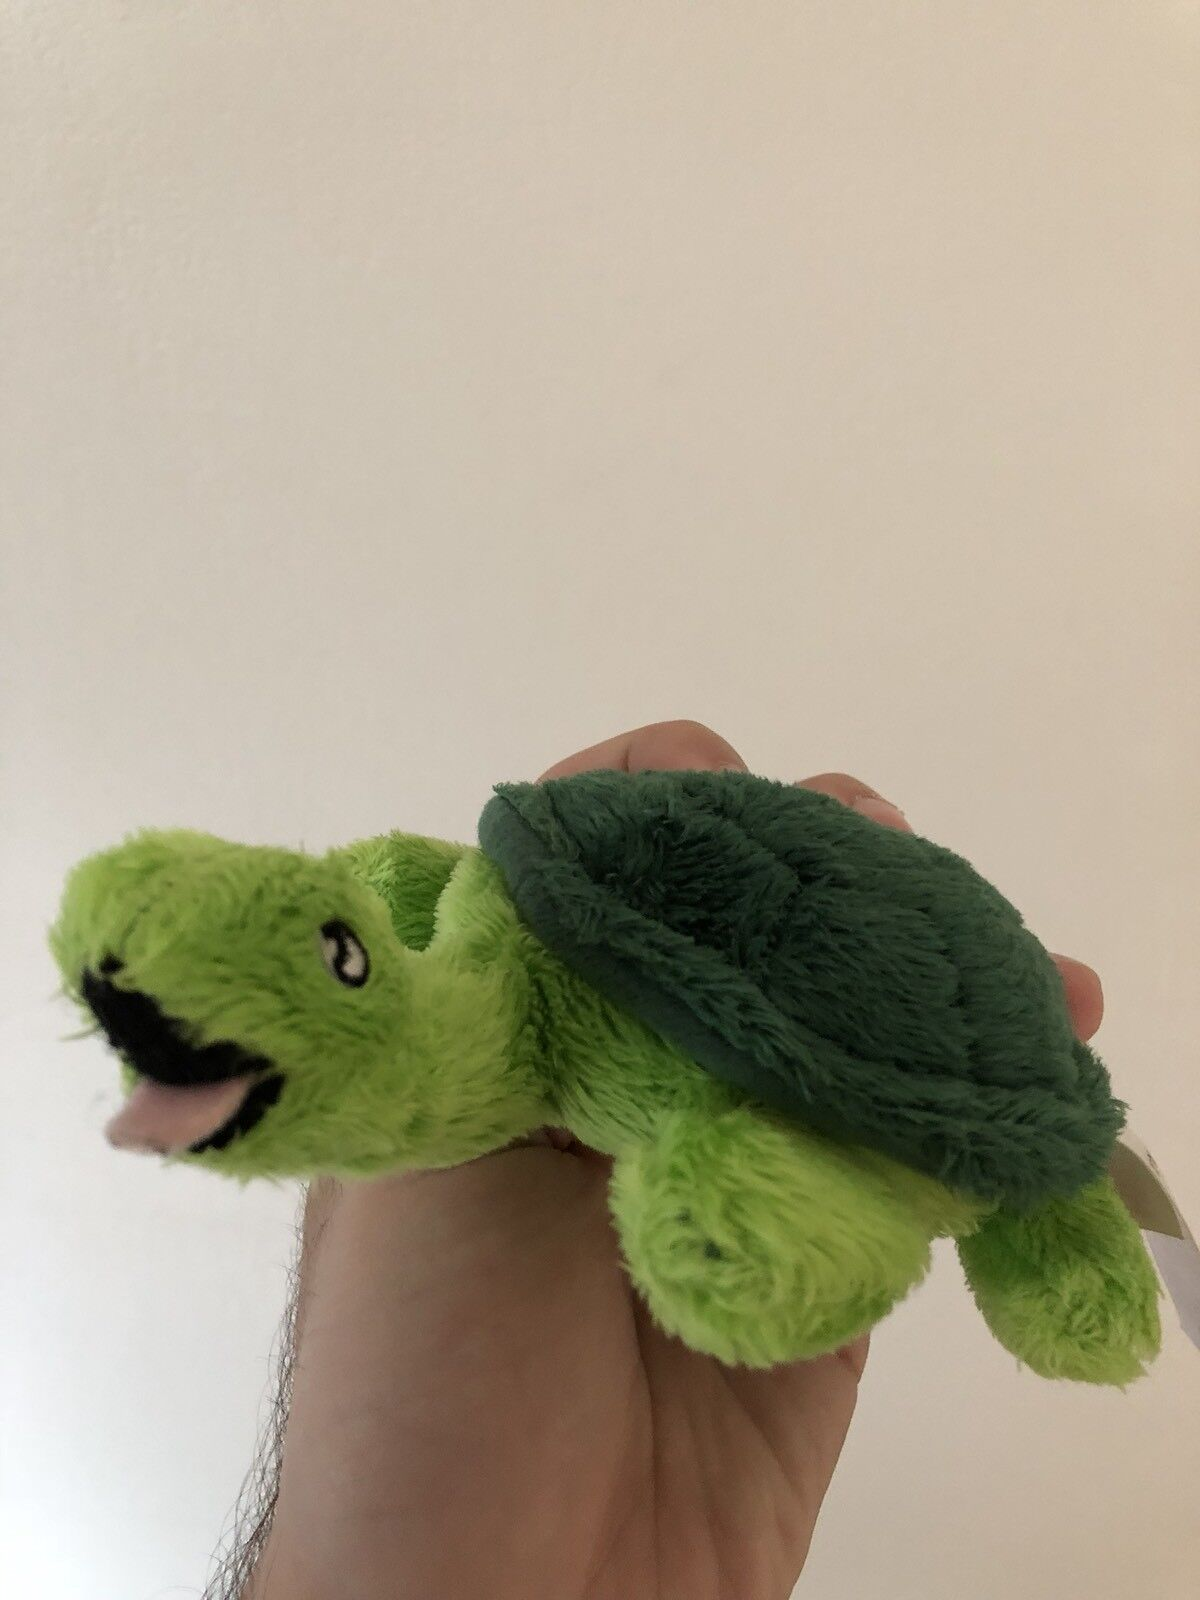 The Plaza Hotel Plush Turtle Stuffed Stuffed Stuffed Animal Doll Toy Kids Manhatten New York 7f138b